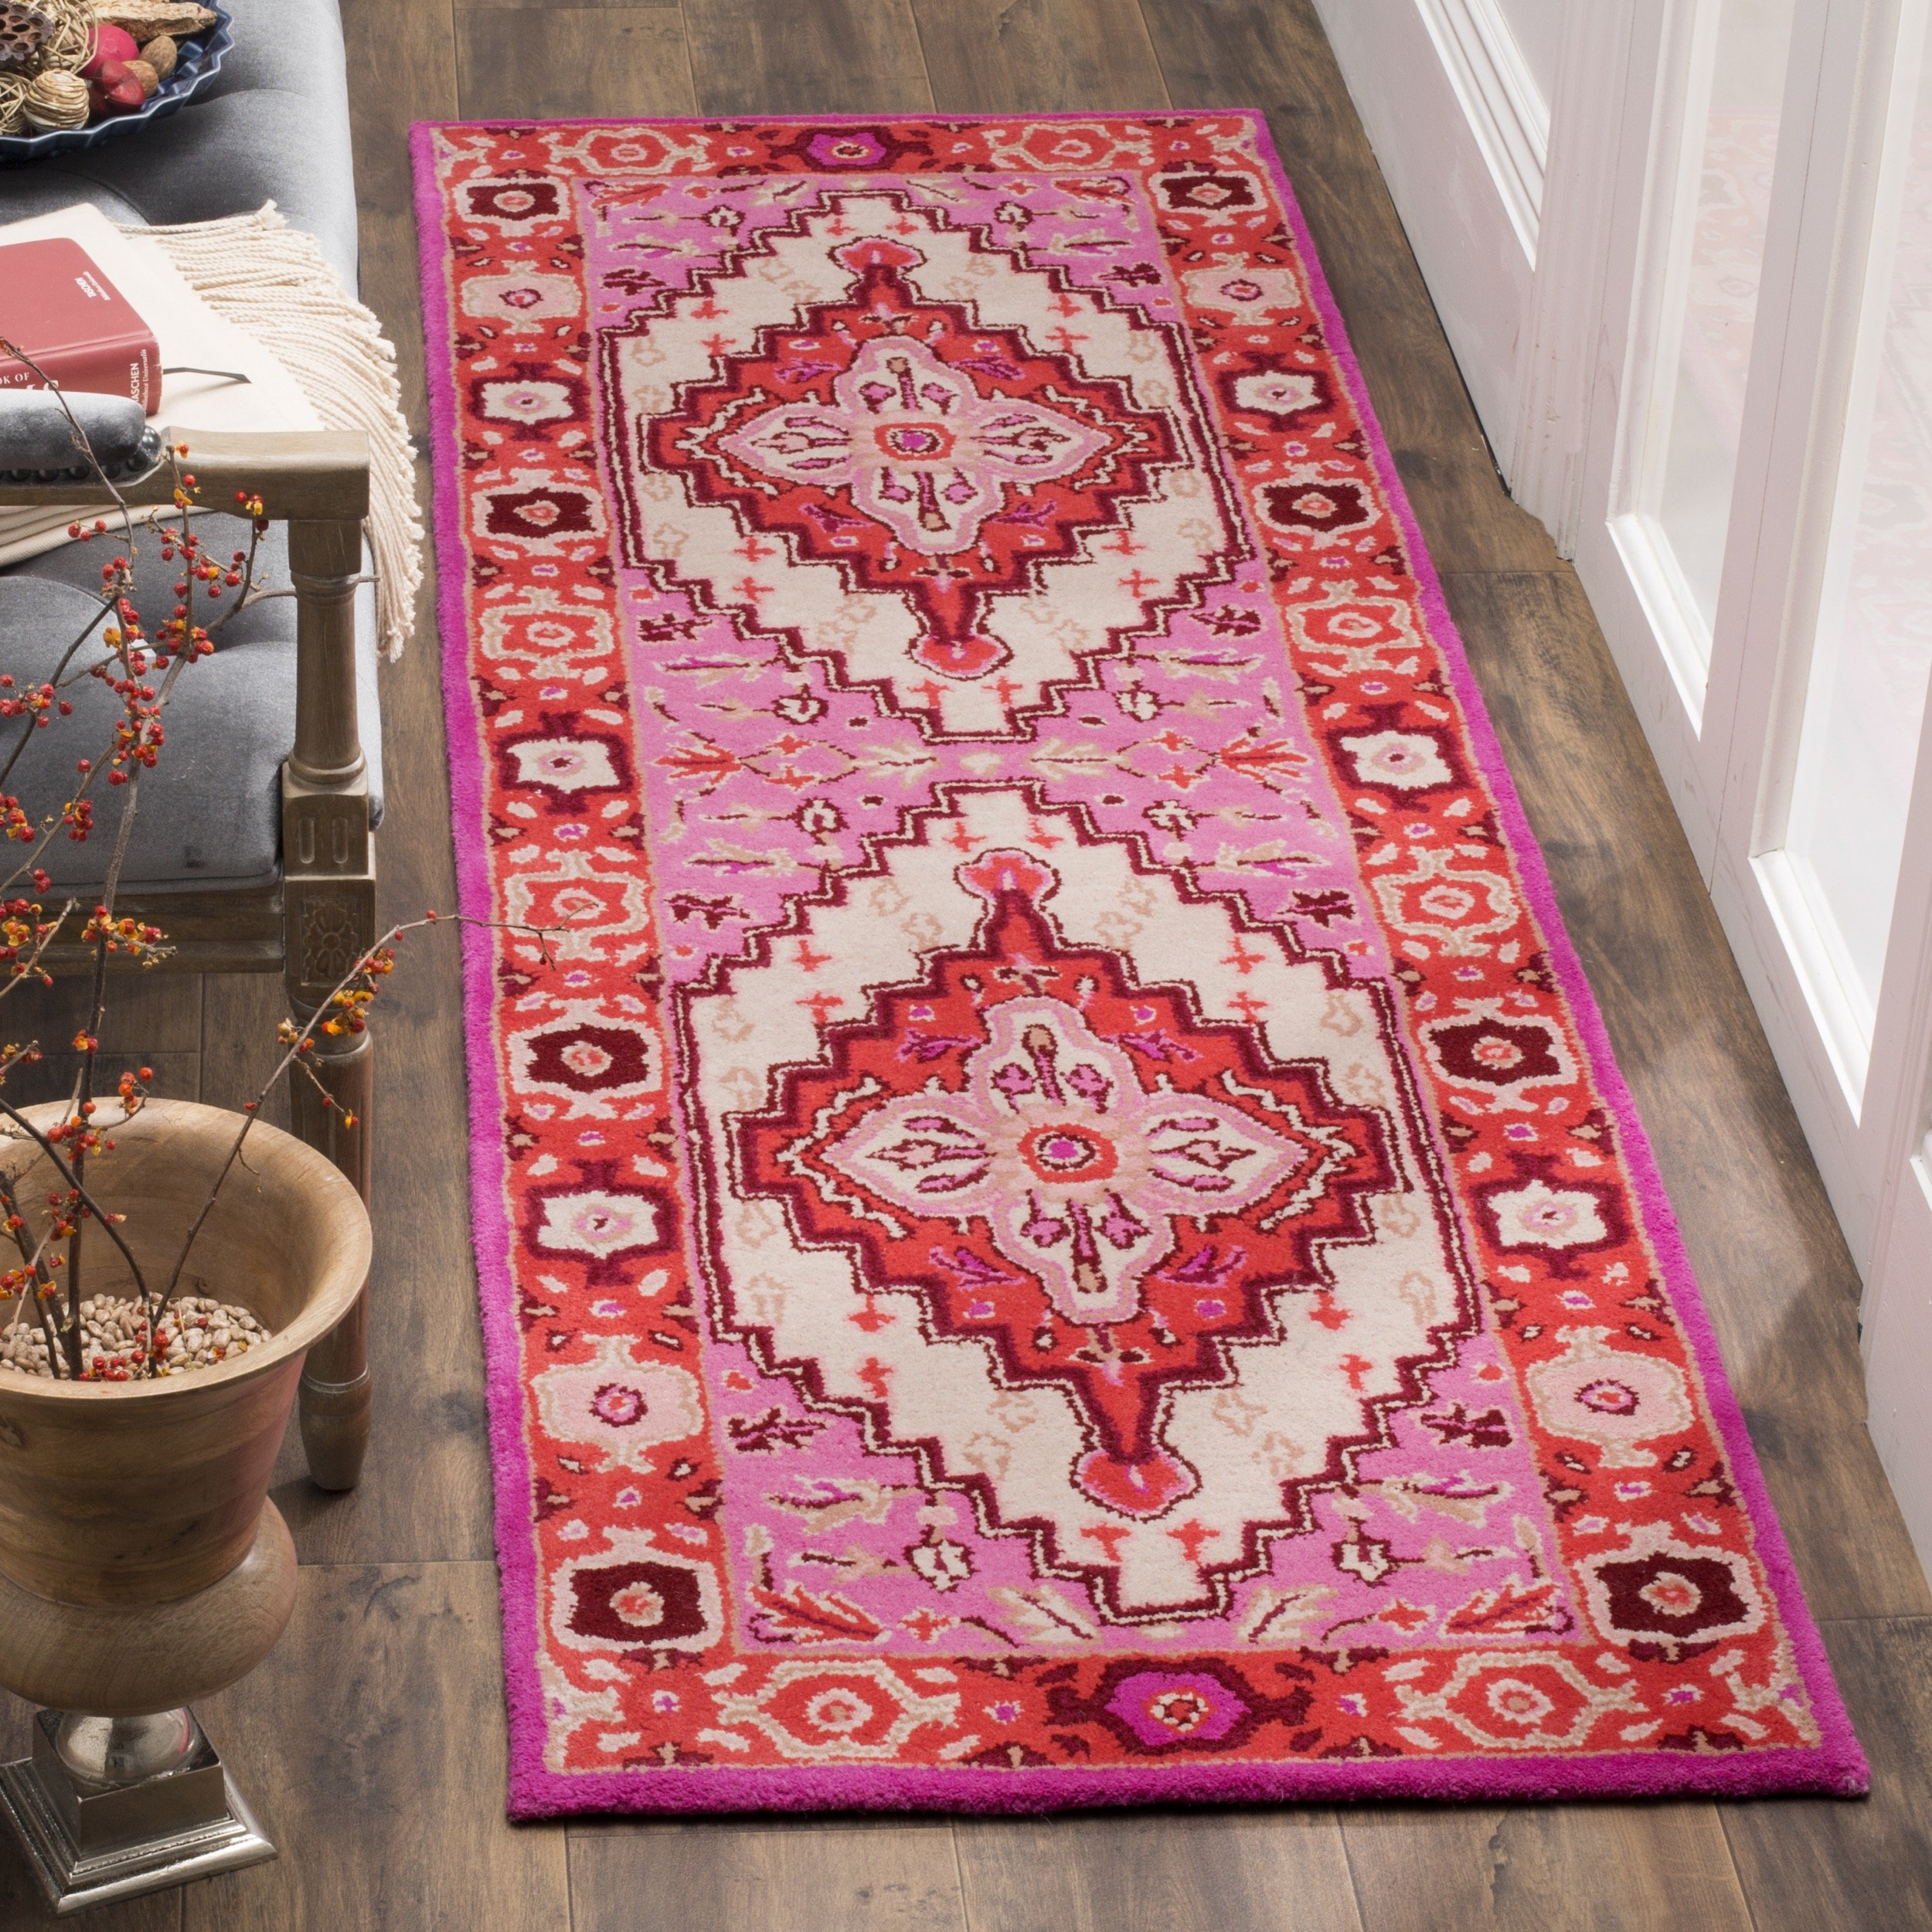 Amazon Com Safavieh Bellagio Collection Blg545a Handmade Medallion Premium Wool Runner 2 3 X 7 Red Pink Ivory Furniture Decor